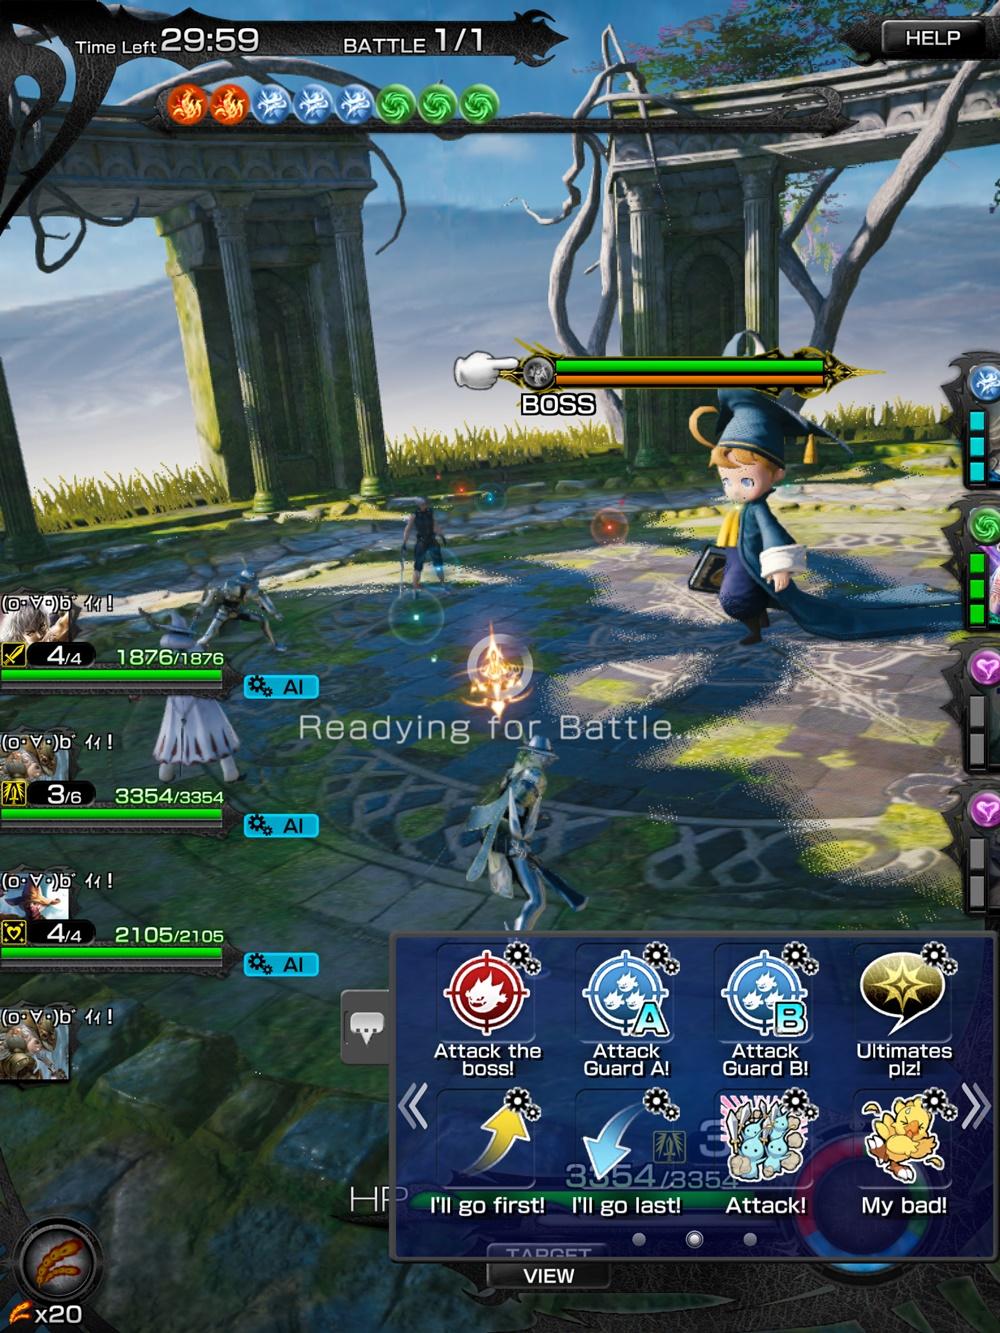 mobius final fantasy multiplayer guide